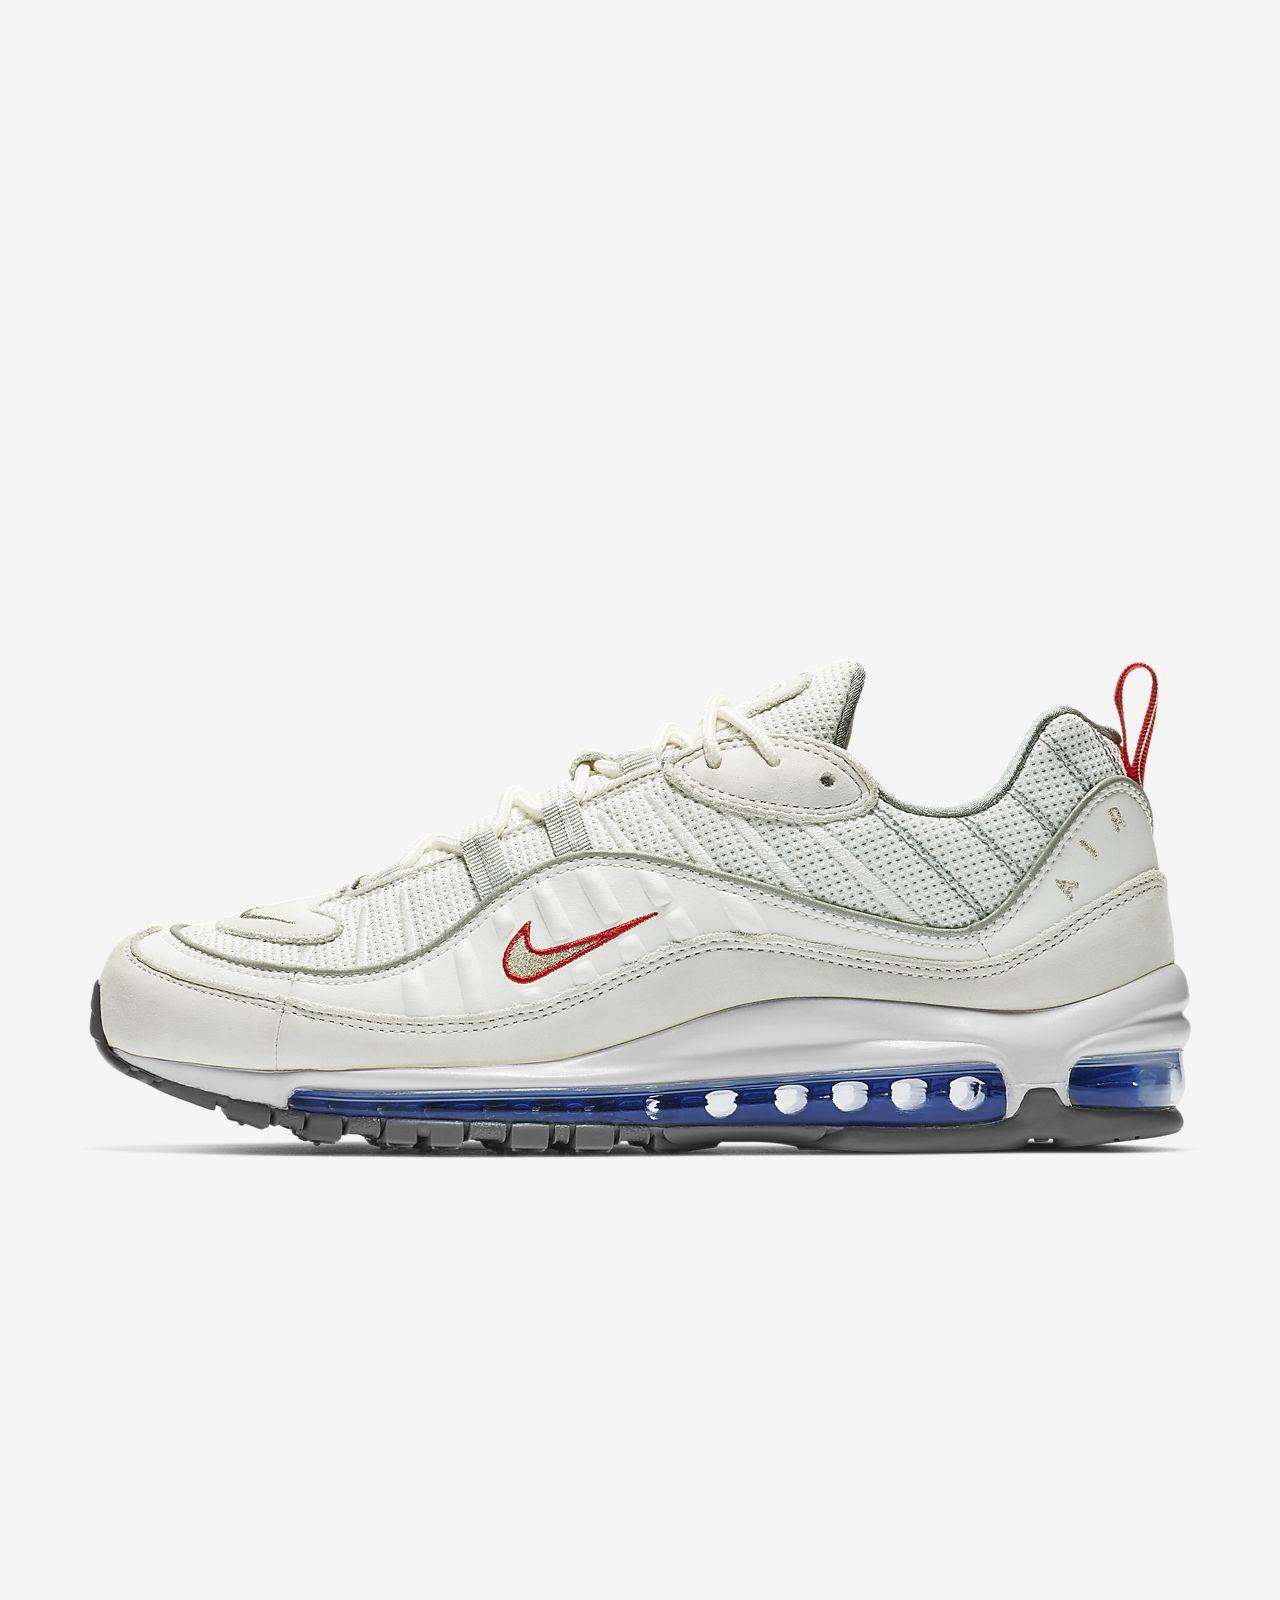 watch 3247c a6205 ... Calzado para hombre Nike Air Max 98